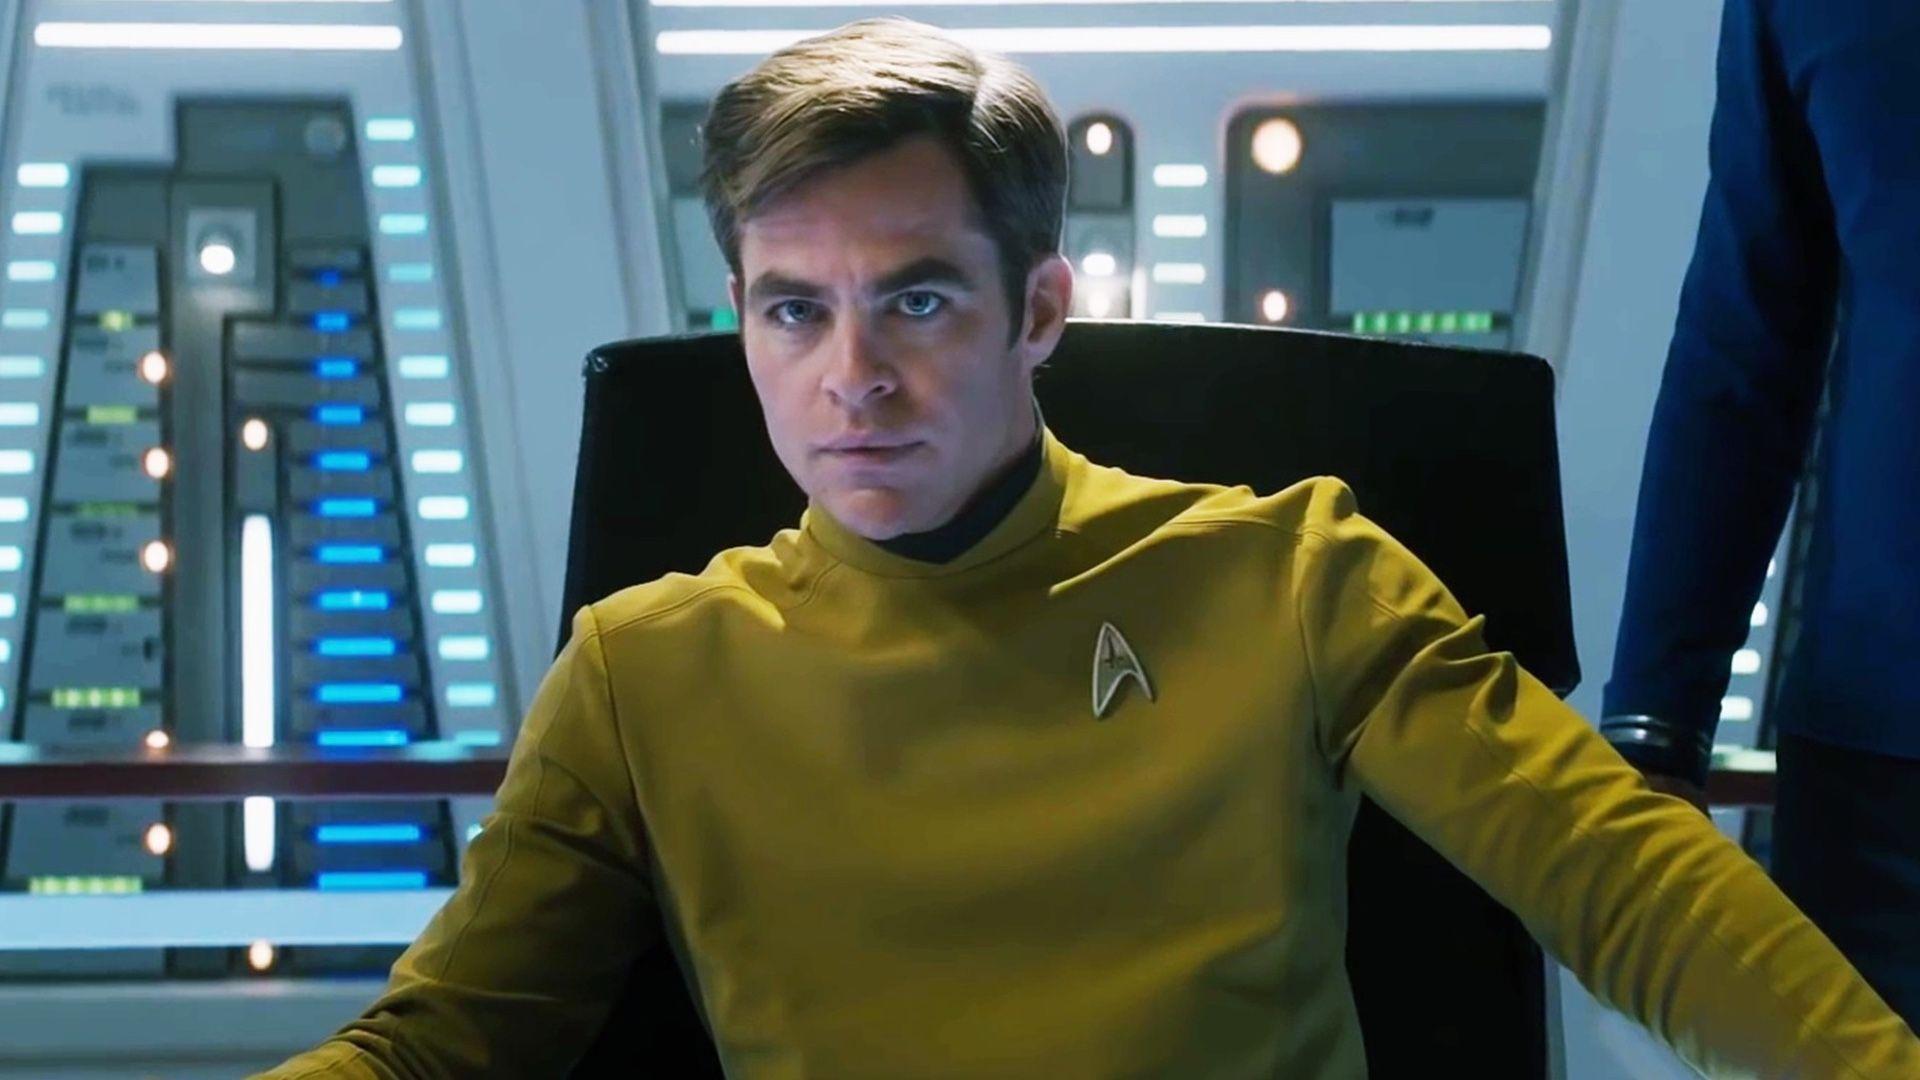 Quentin Tarantino's Star Trek Movie Is Back On, Chris Pine To Star